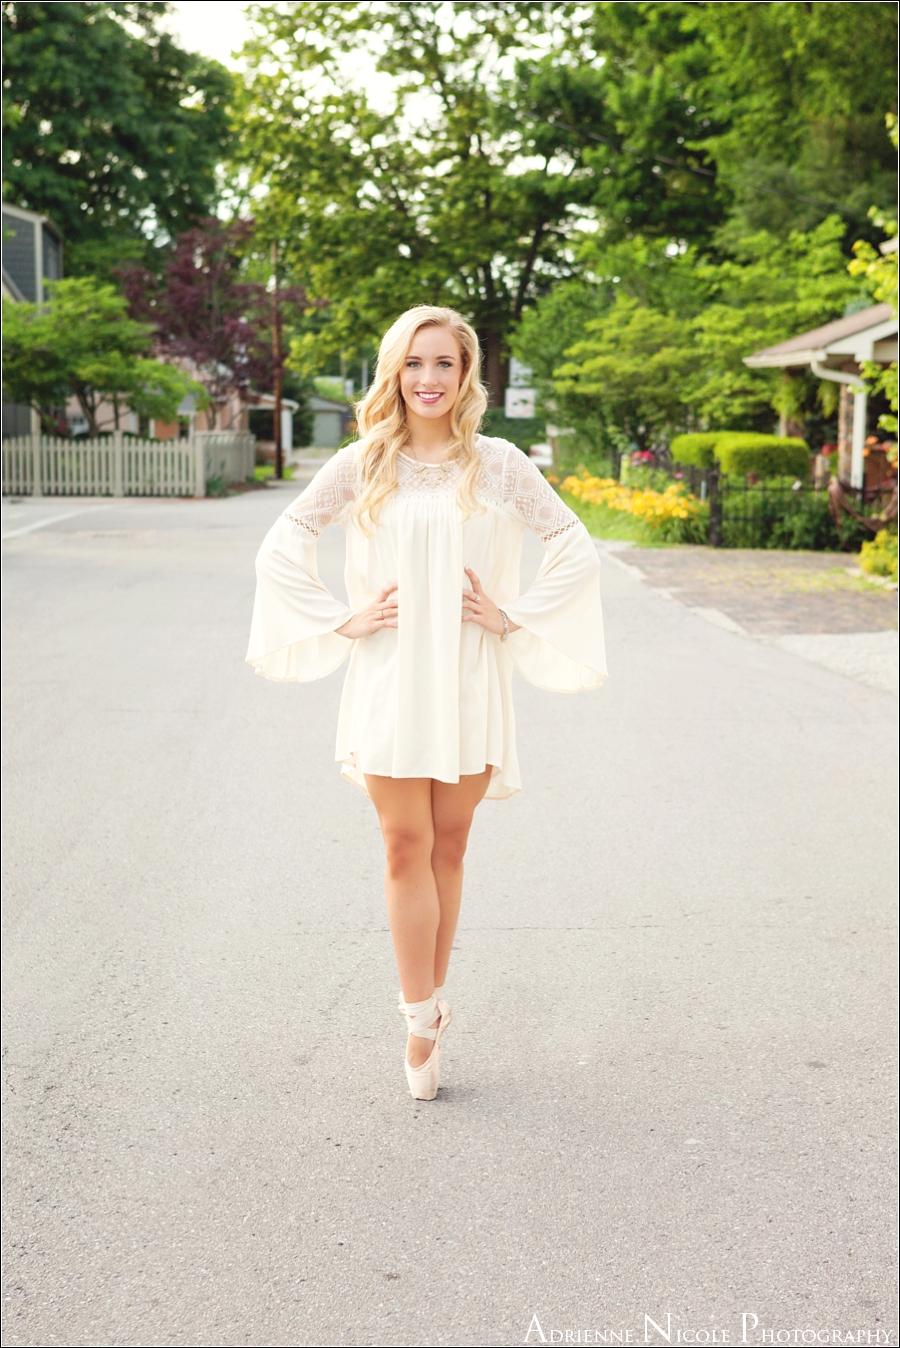 Adrienne Nicole Photography_IndianaSeniorPictures_Avon_0479.jpg